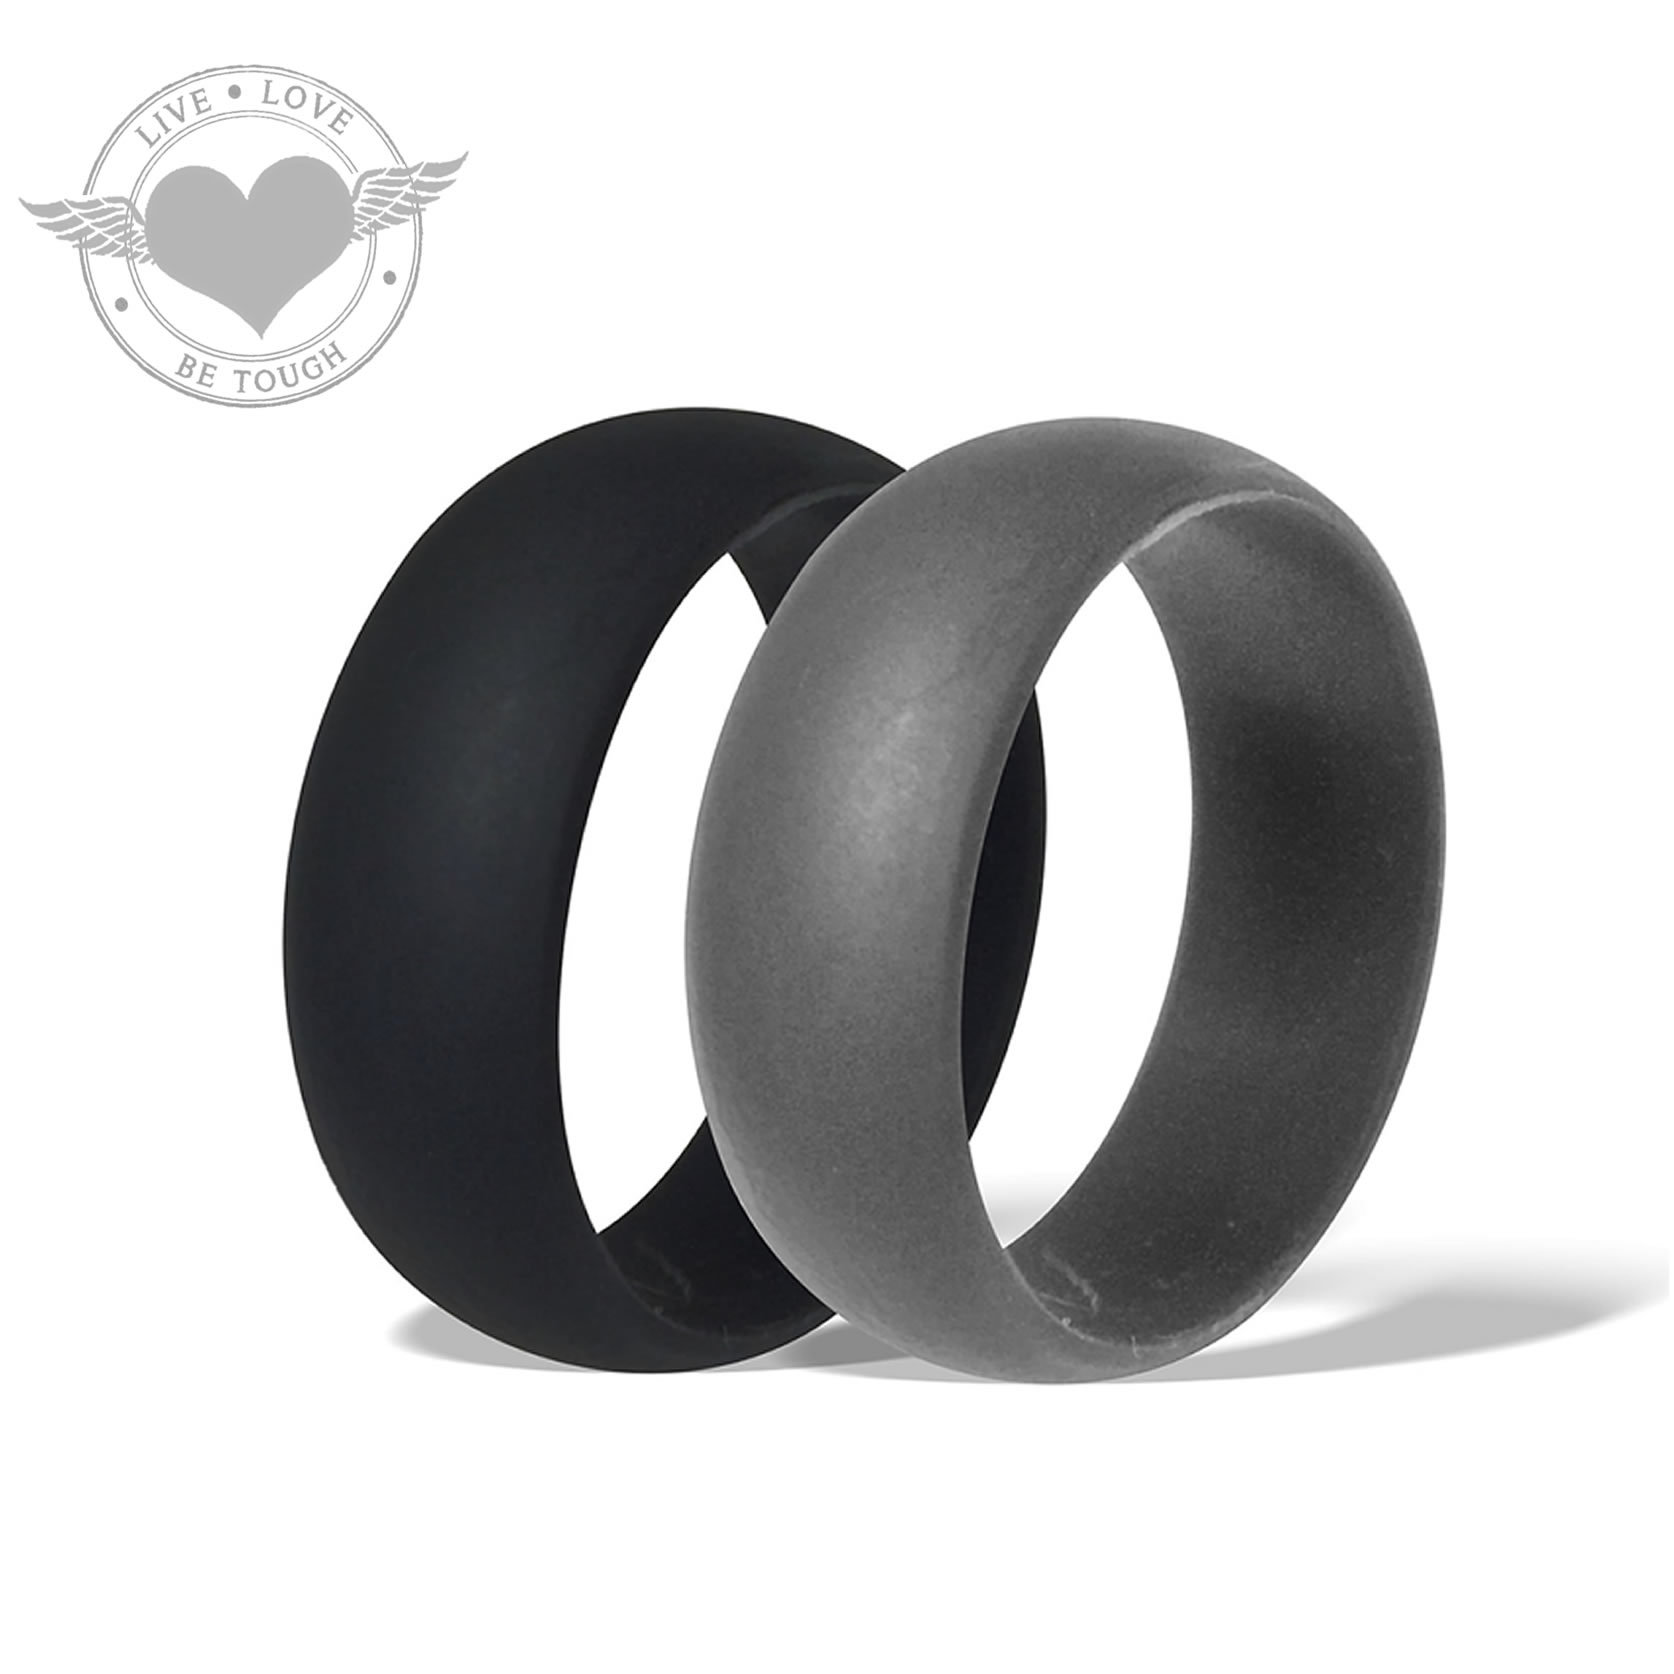 BUNDLE TOUGH Black And Gray Silicone Ring Set